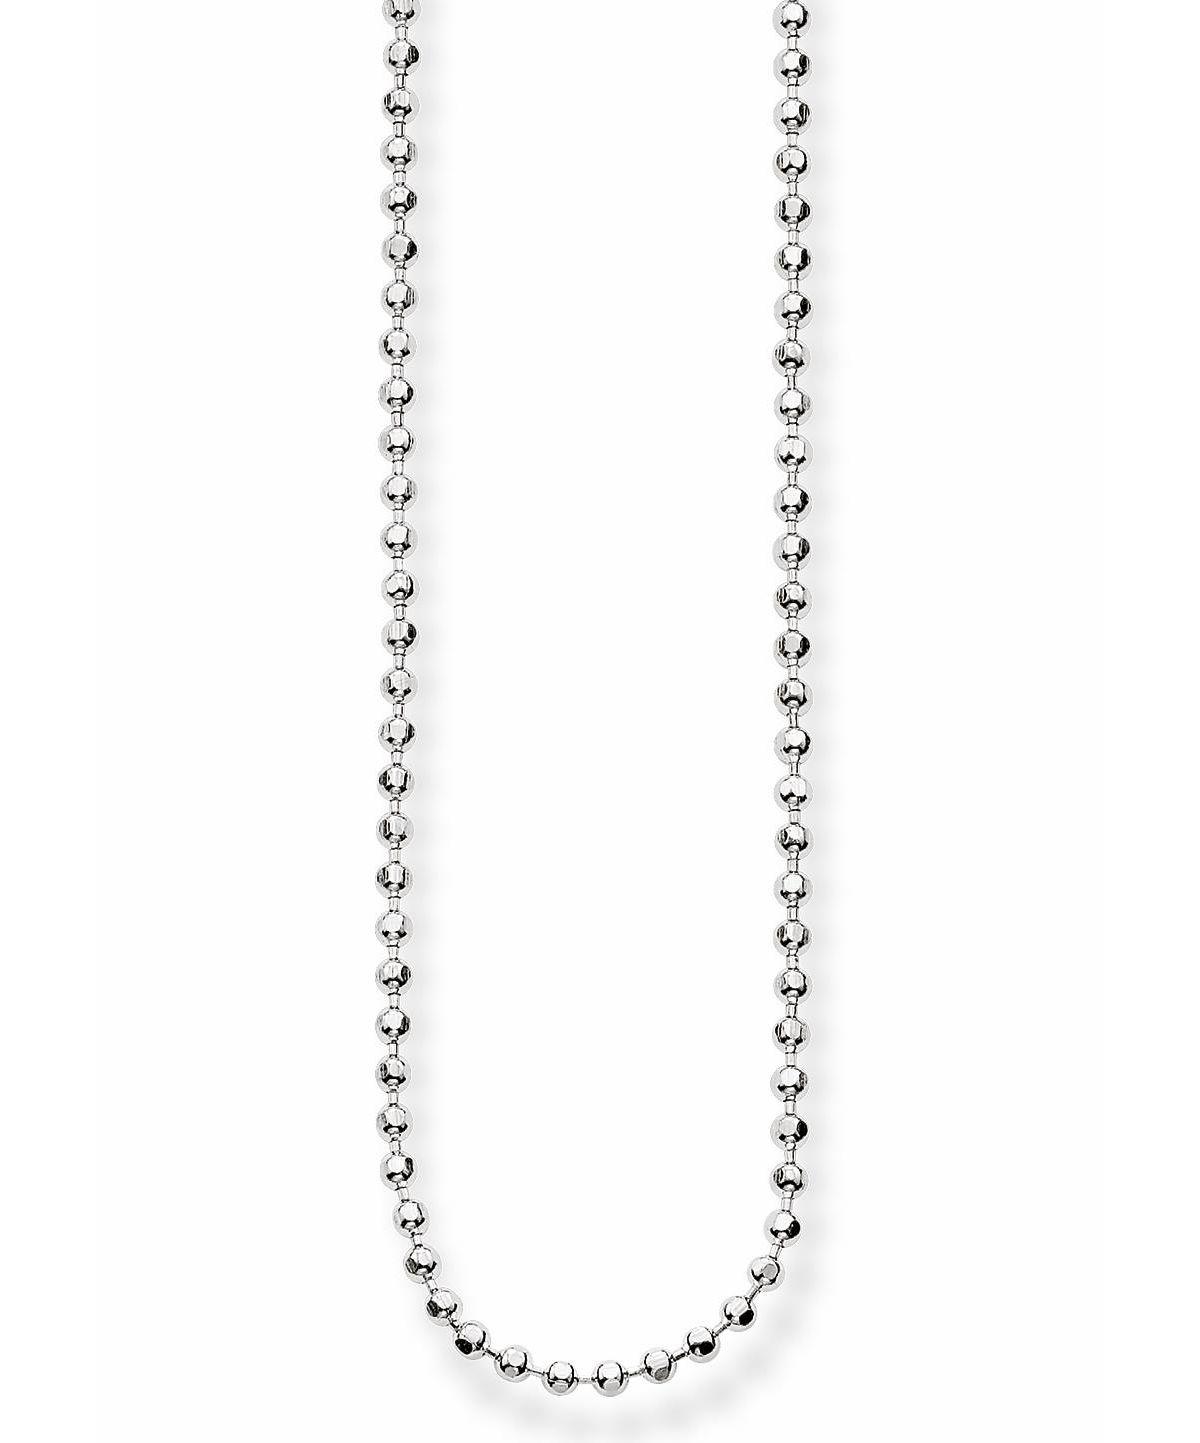 THOMAS SABO Silberkette »KE1347-001-12-L42v, L5...